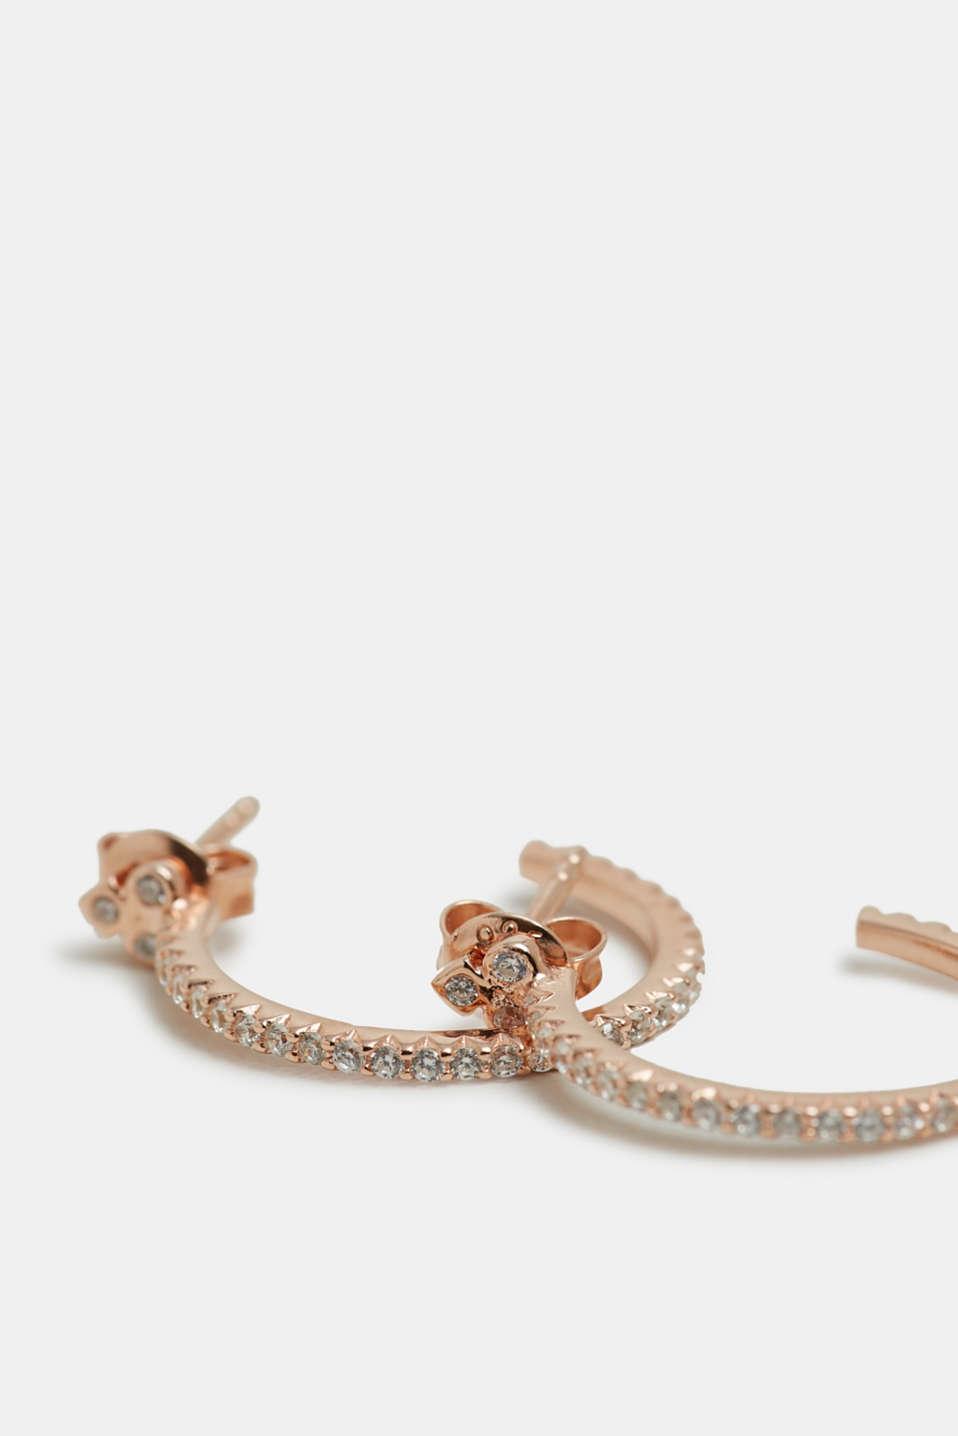 Hoop earrings with zirconia, sterling silver, ROSEGOLD, detail image number 1